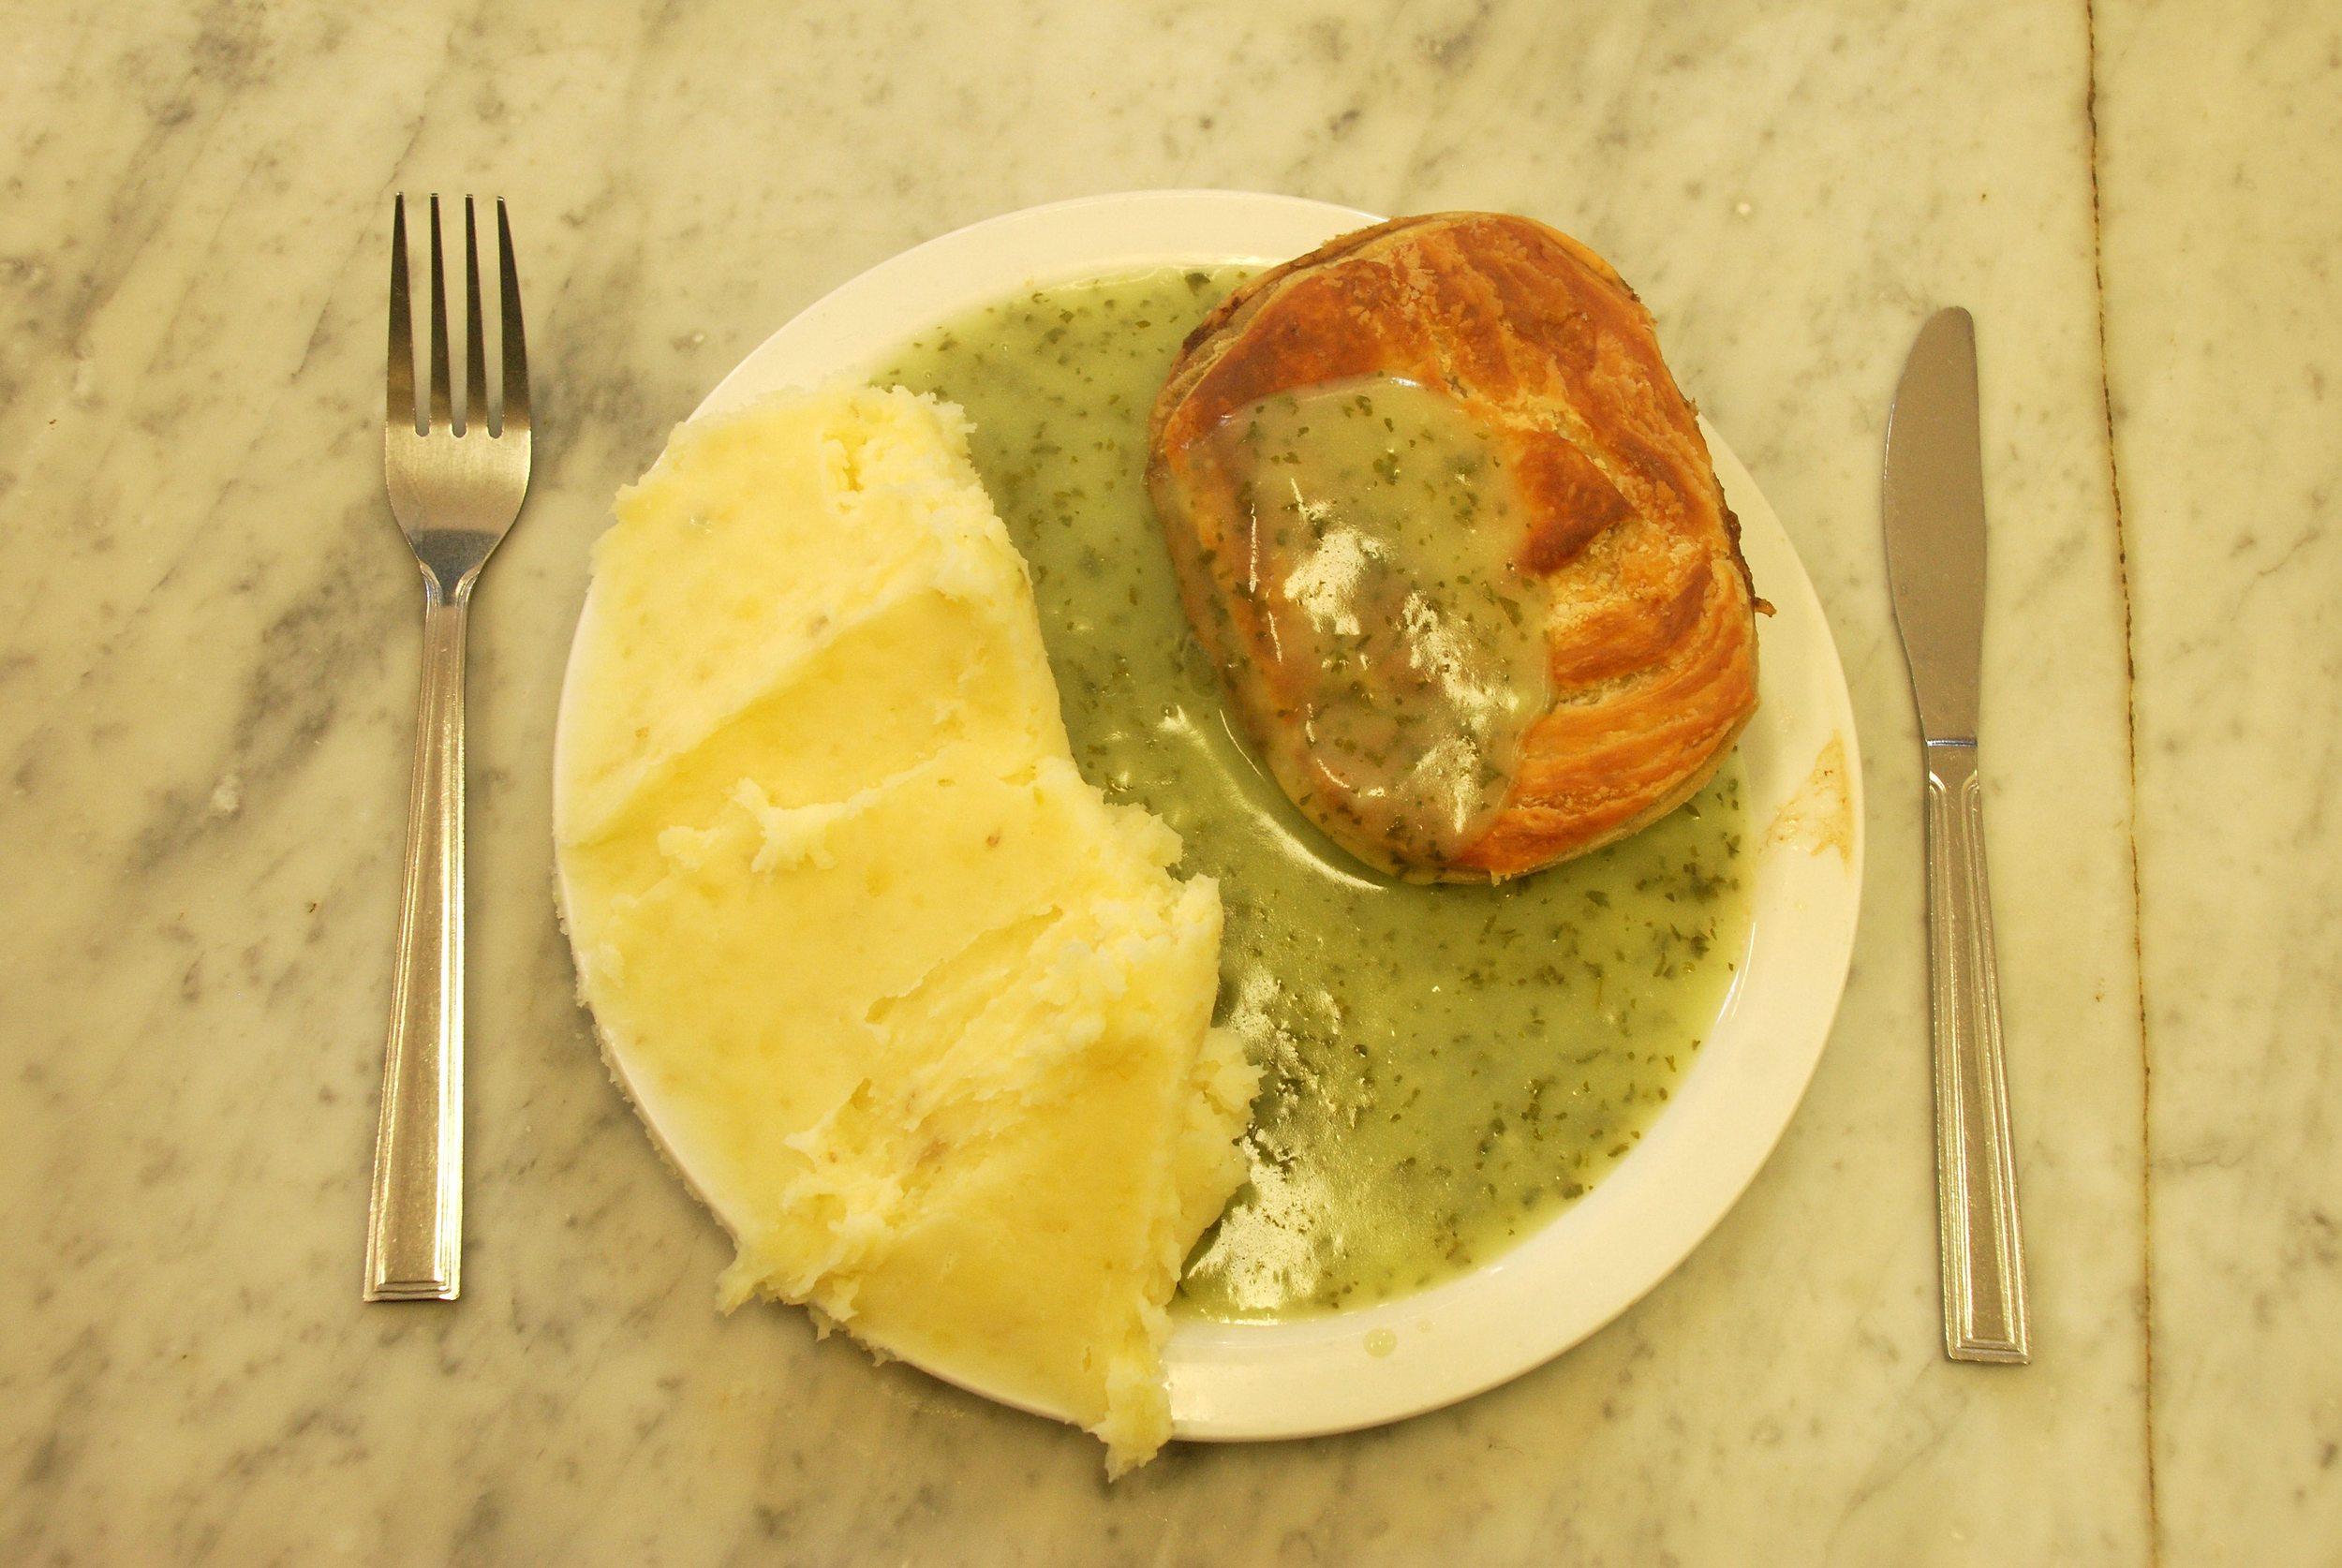 Pie'n'mash and liquor sauce at Manze's on Tower Bridge Road